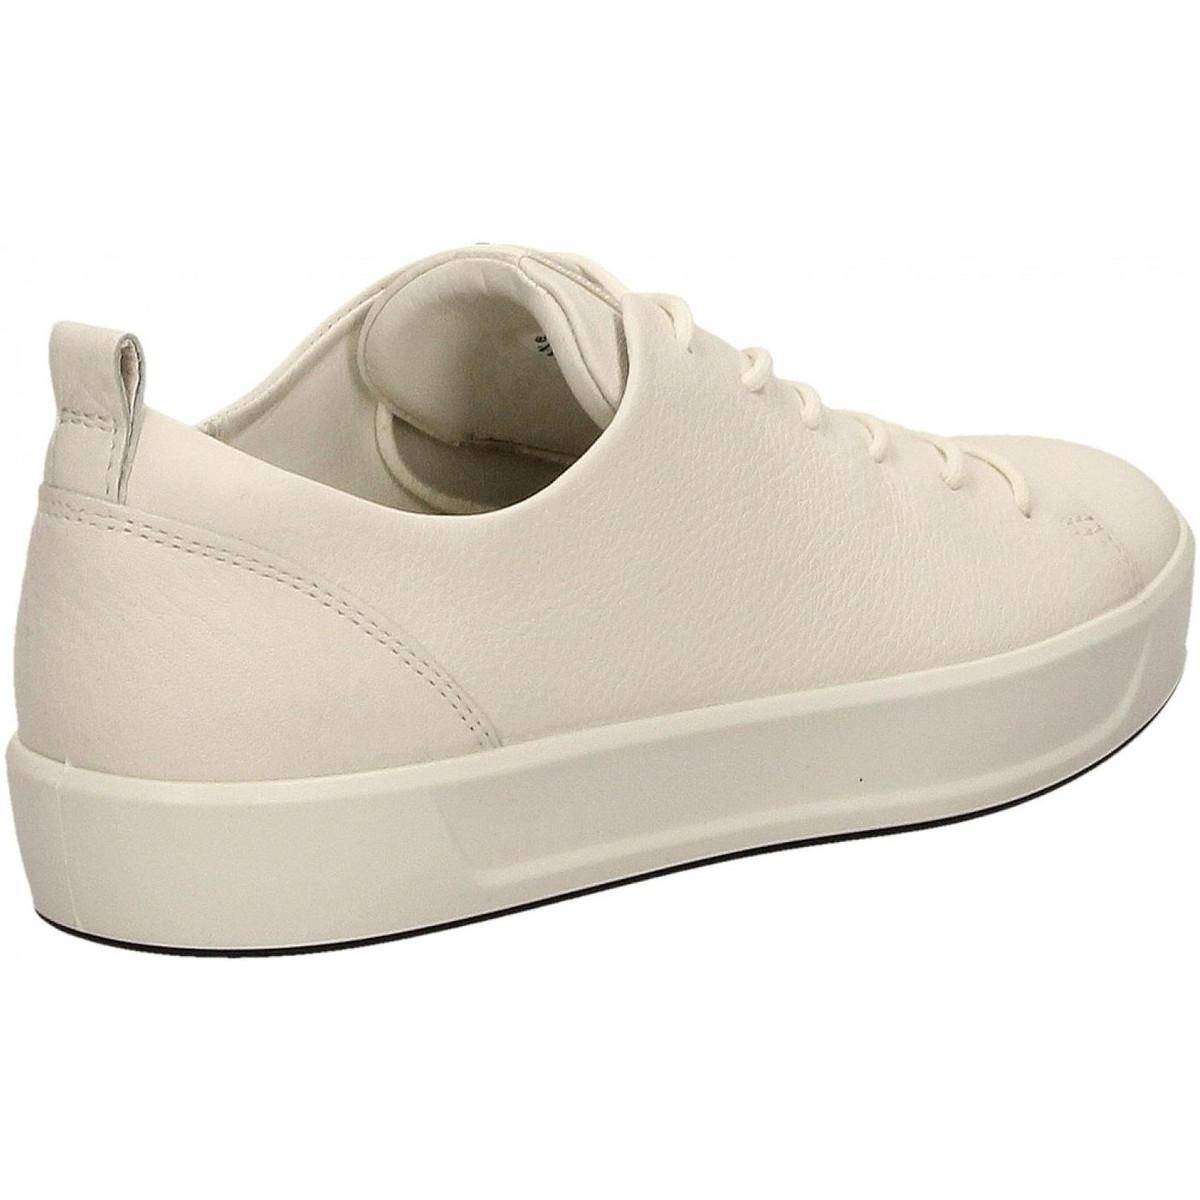 Soft 8 W White Trento Chaussures Ecco